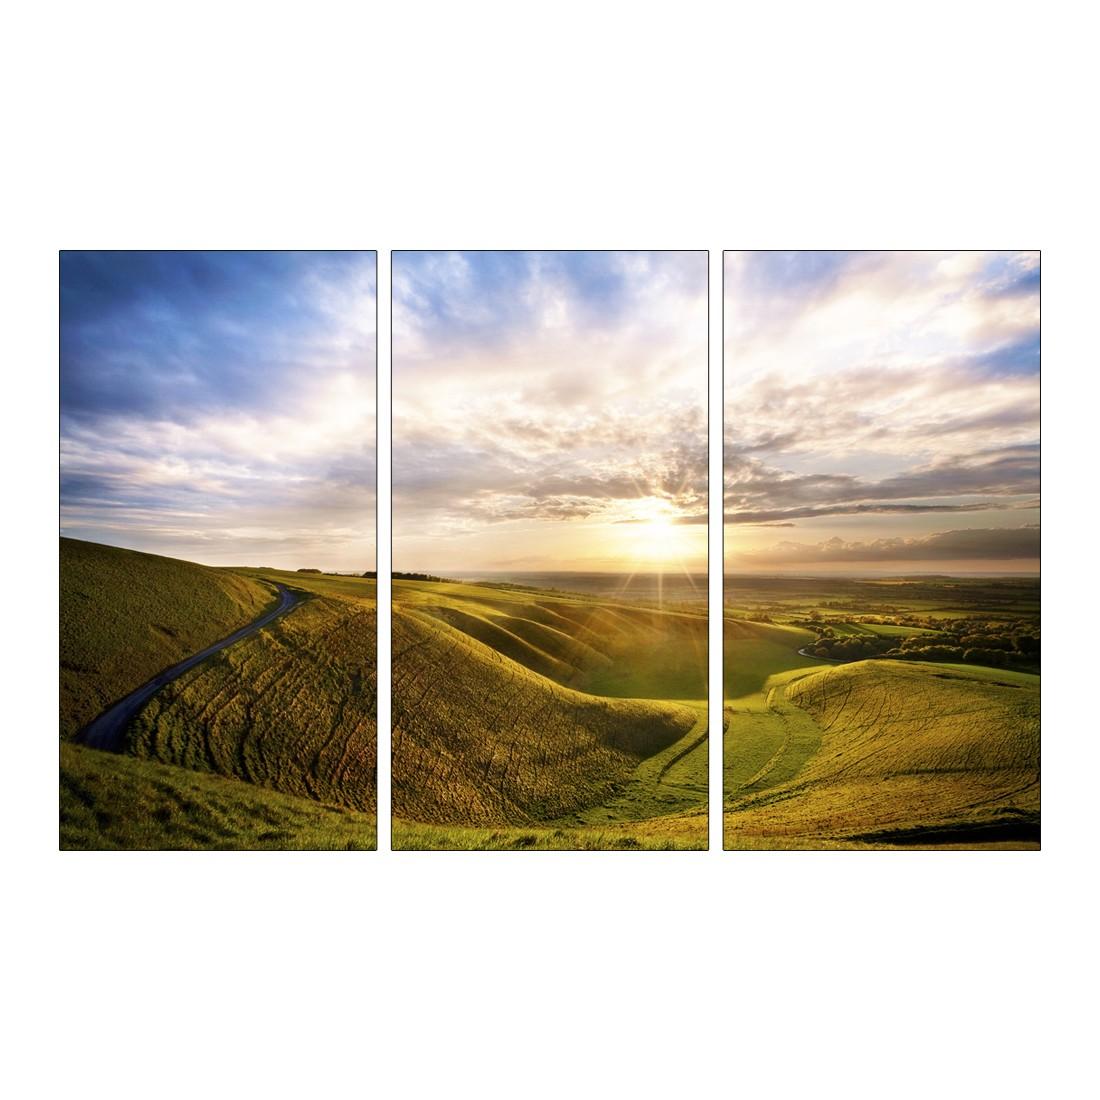 Leinwandbild LOVELY SUNRISE LIGHT  – Abmessung 130 x 80 cm, Gallery of Innovative Art günstig